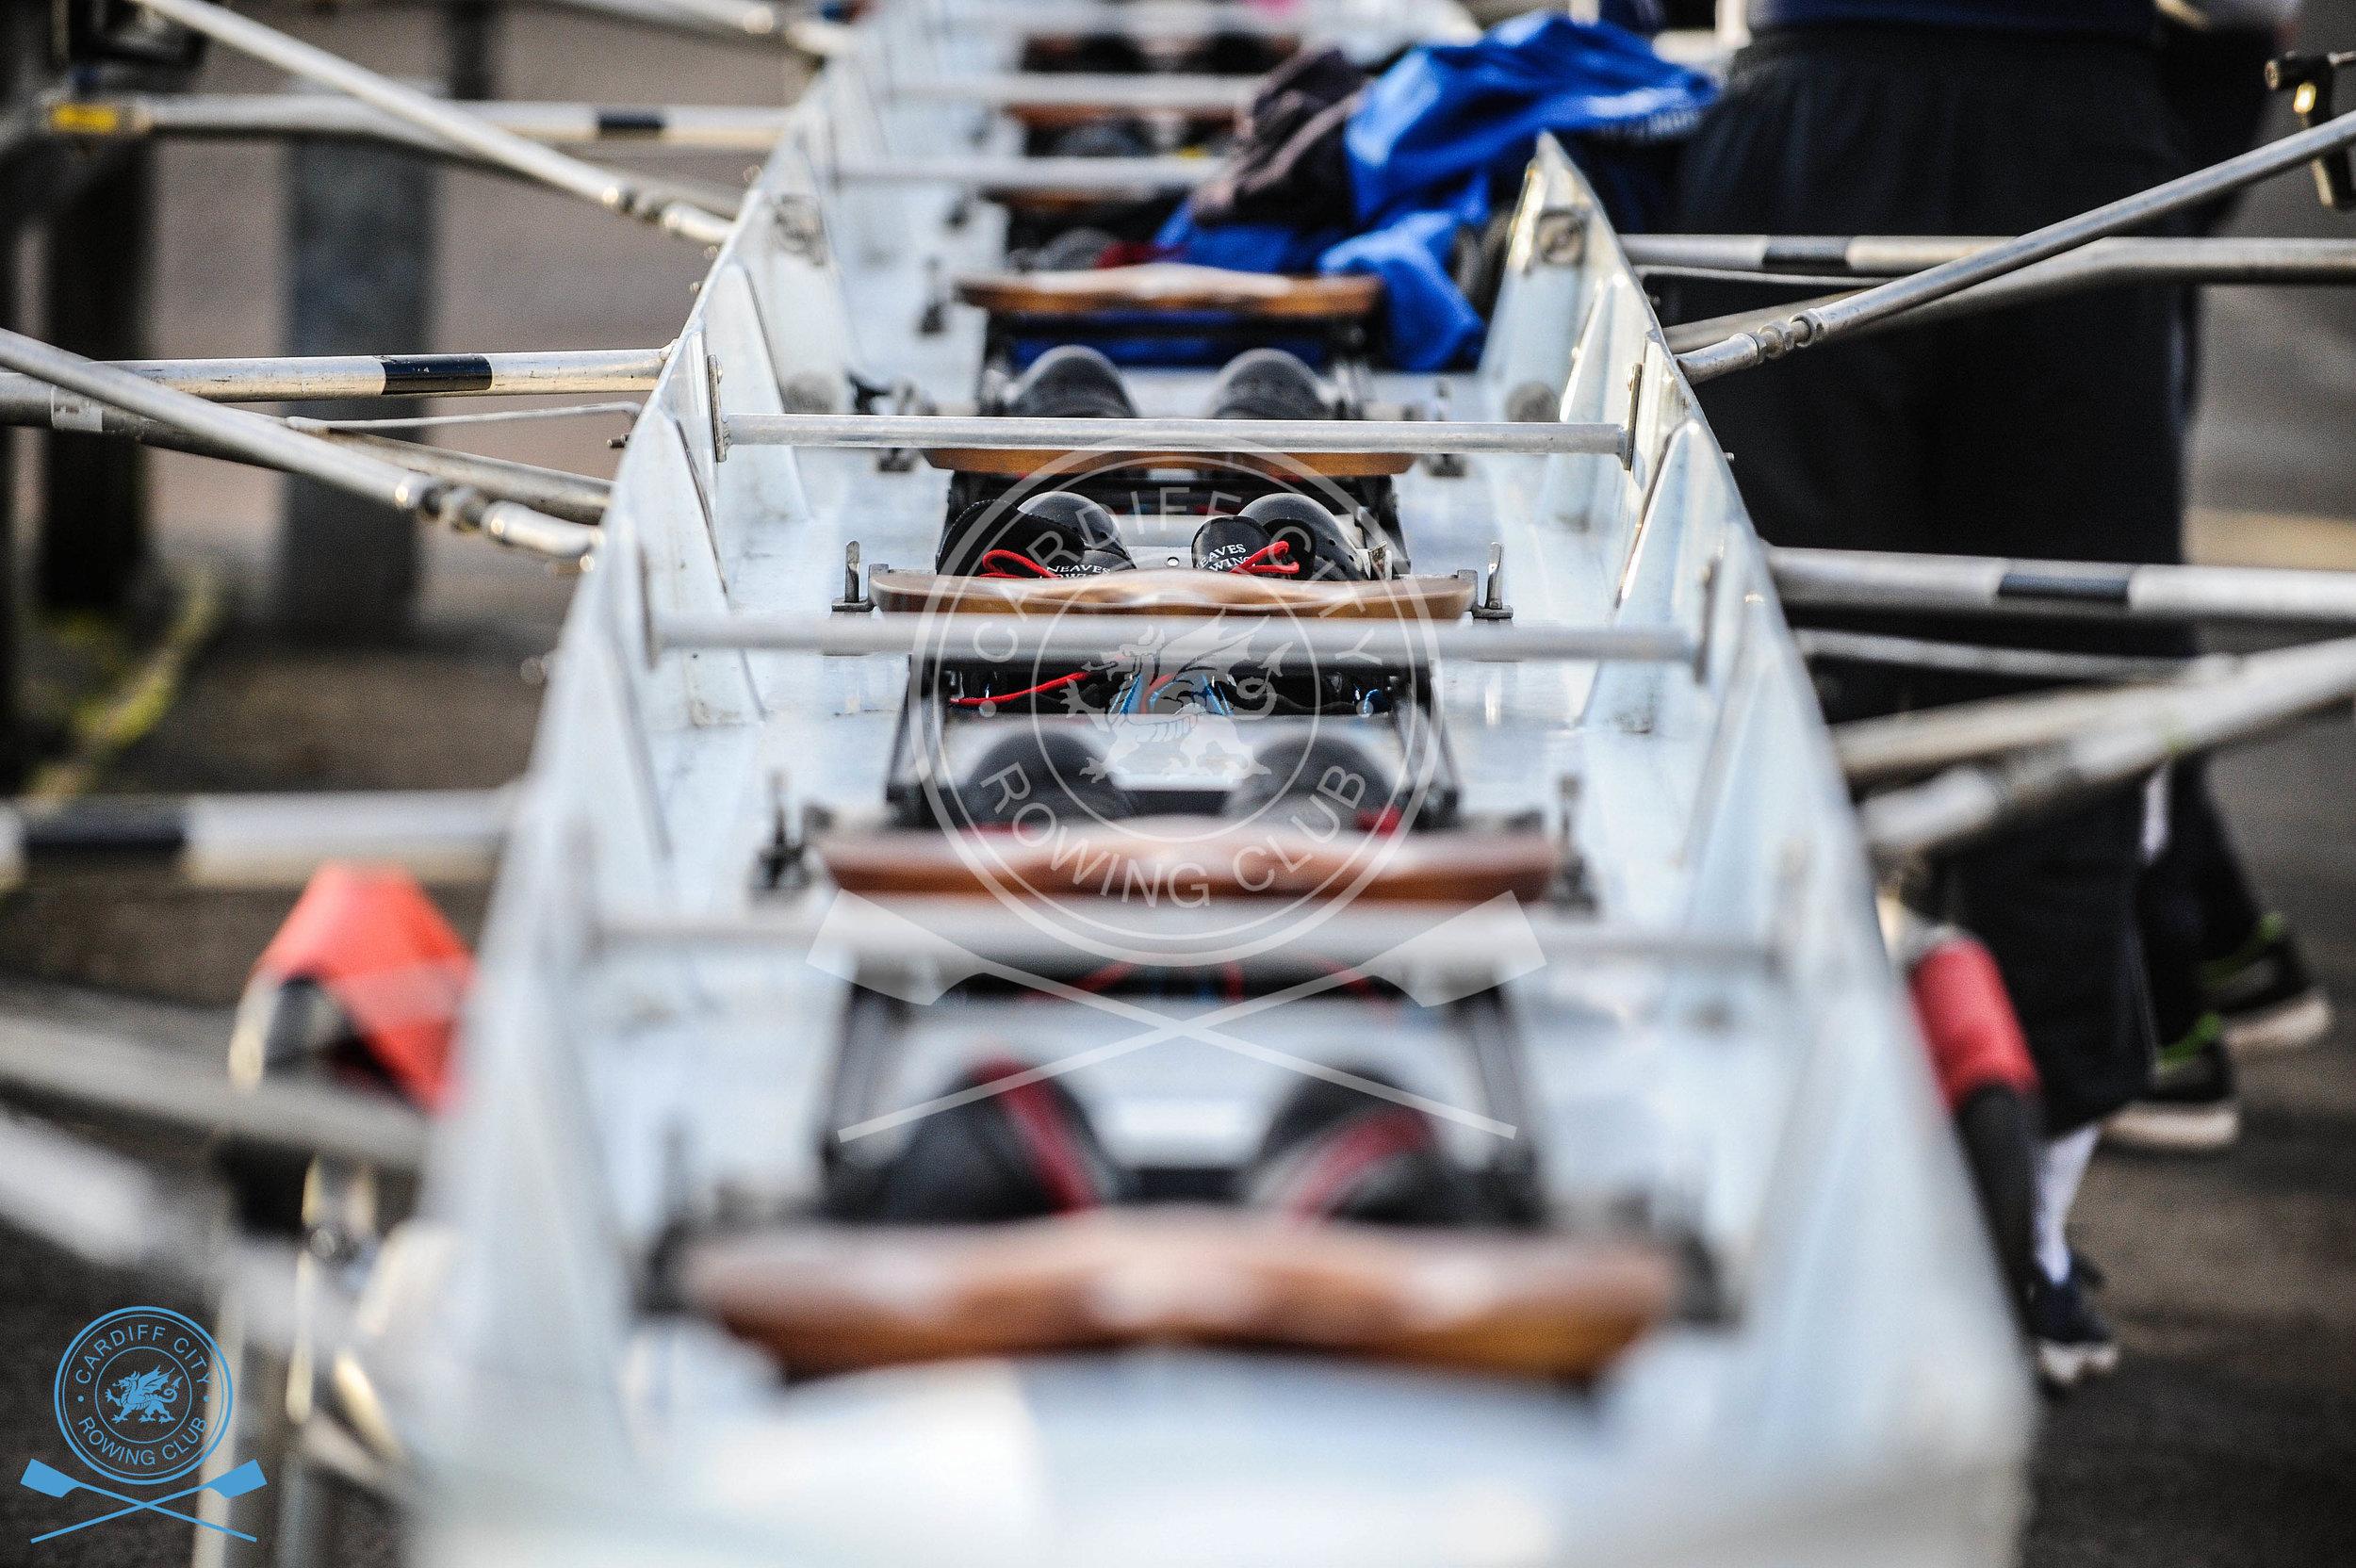 DW_280119_Cardiff_City_Rowing_34.jpg